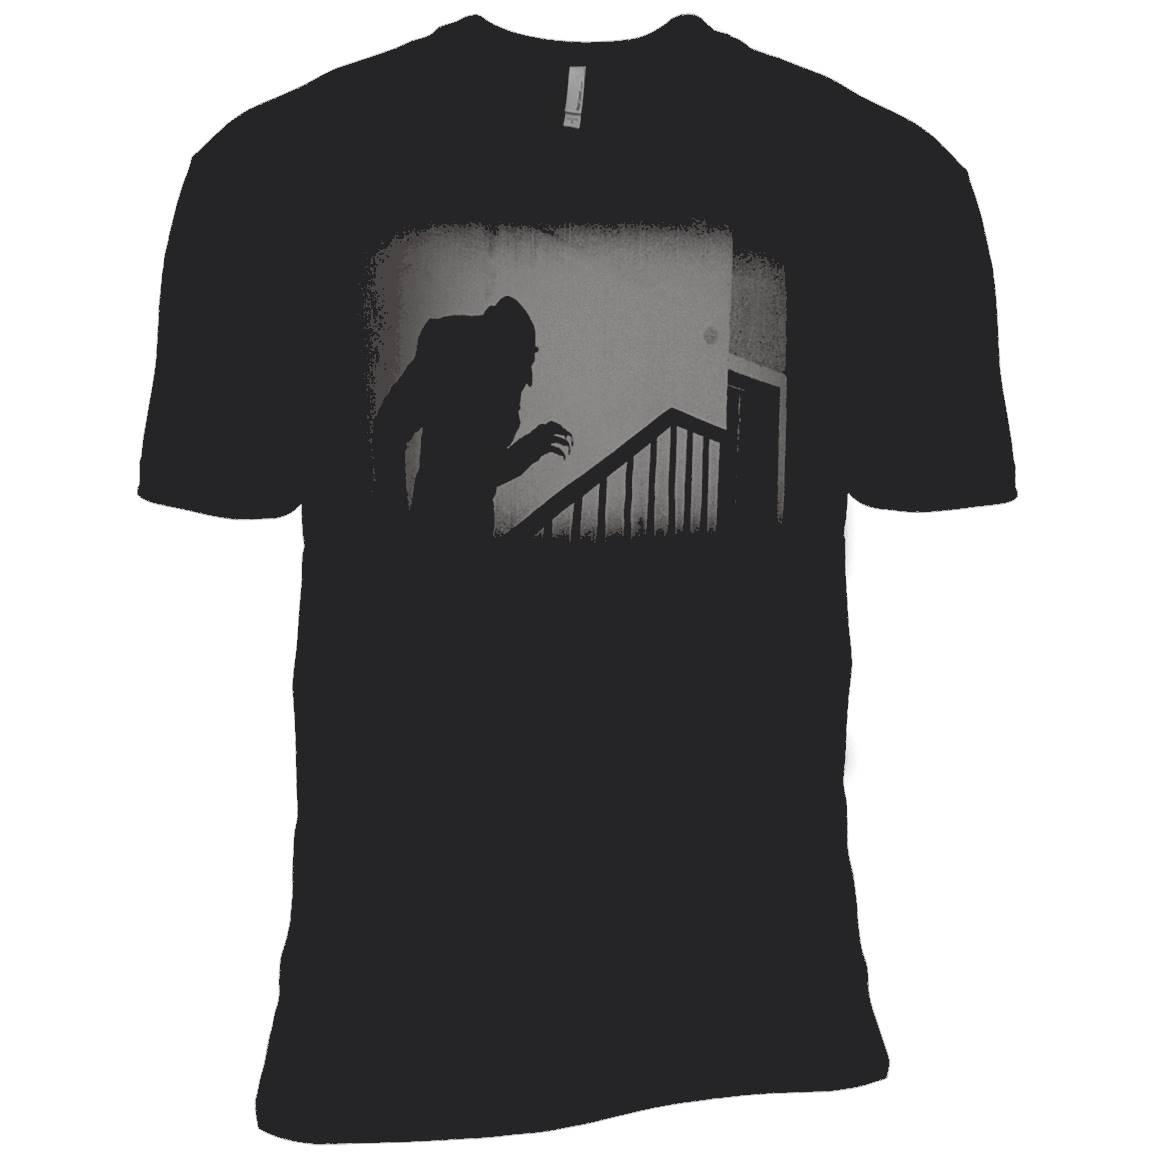 Nosferatu Vampire Classic Horror Black T-Shirt Dracula Men